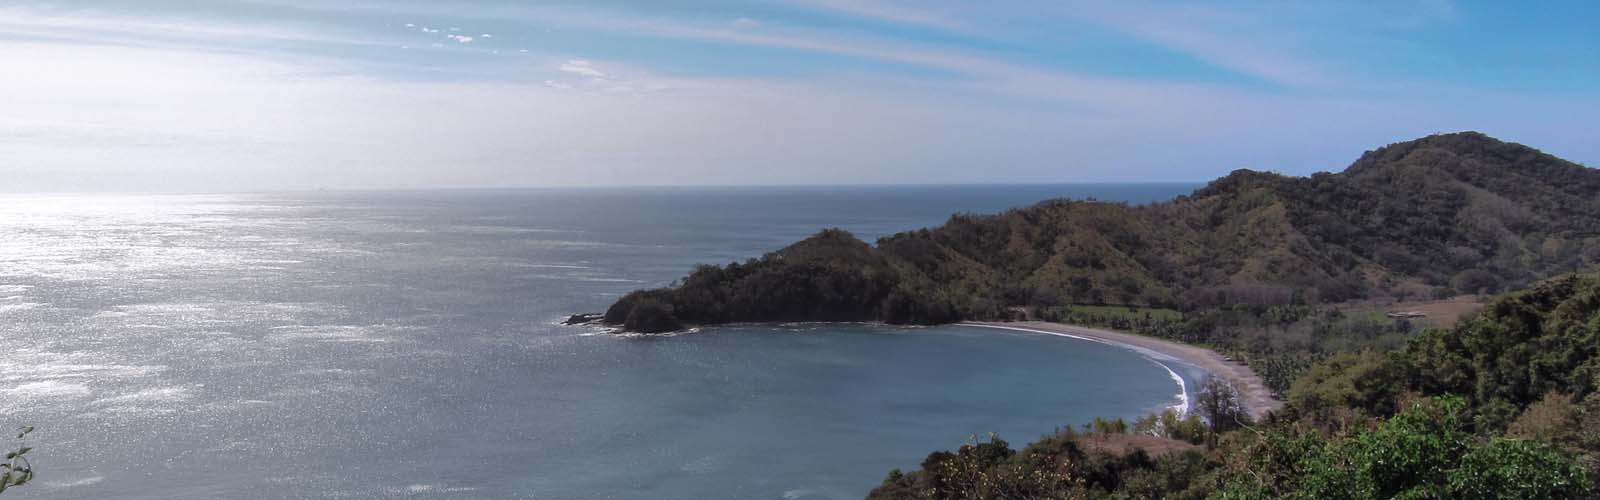 Costa Rica 074-Edit-3